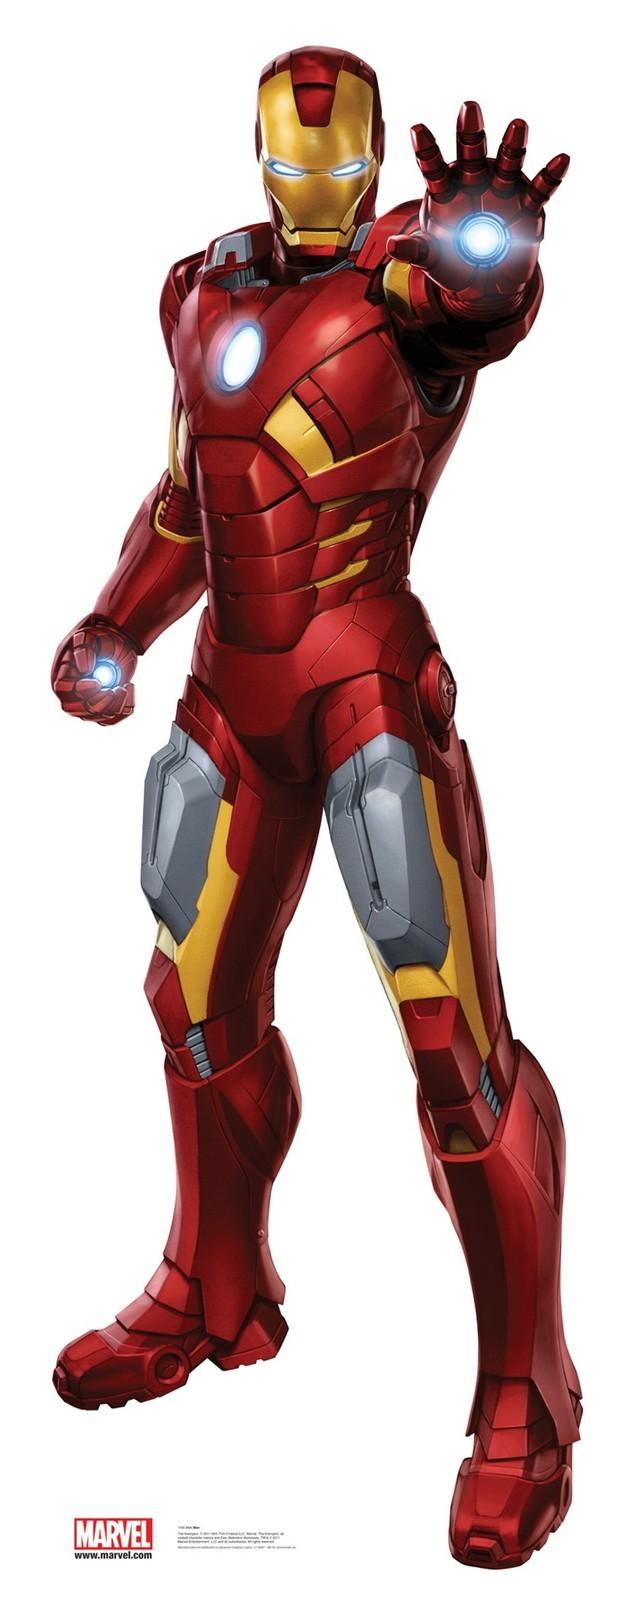 Iron man image clip. Avengers clipart ironman